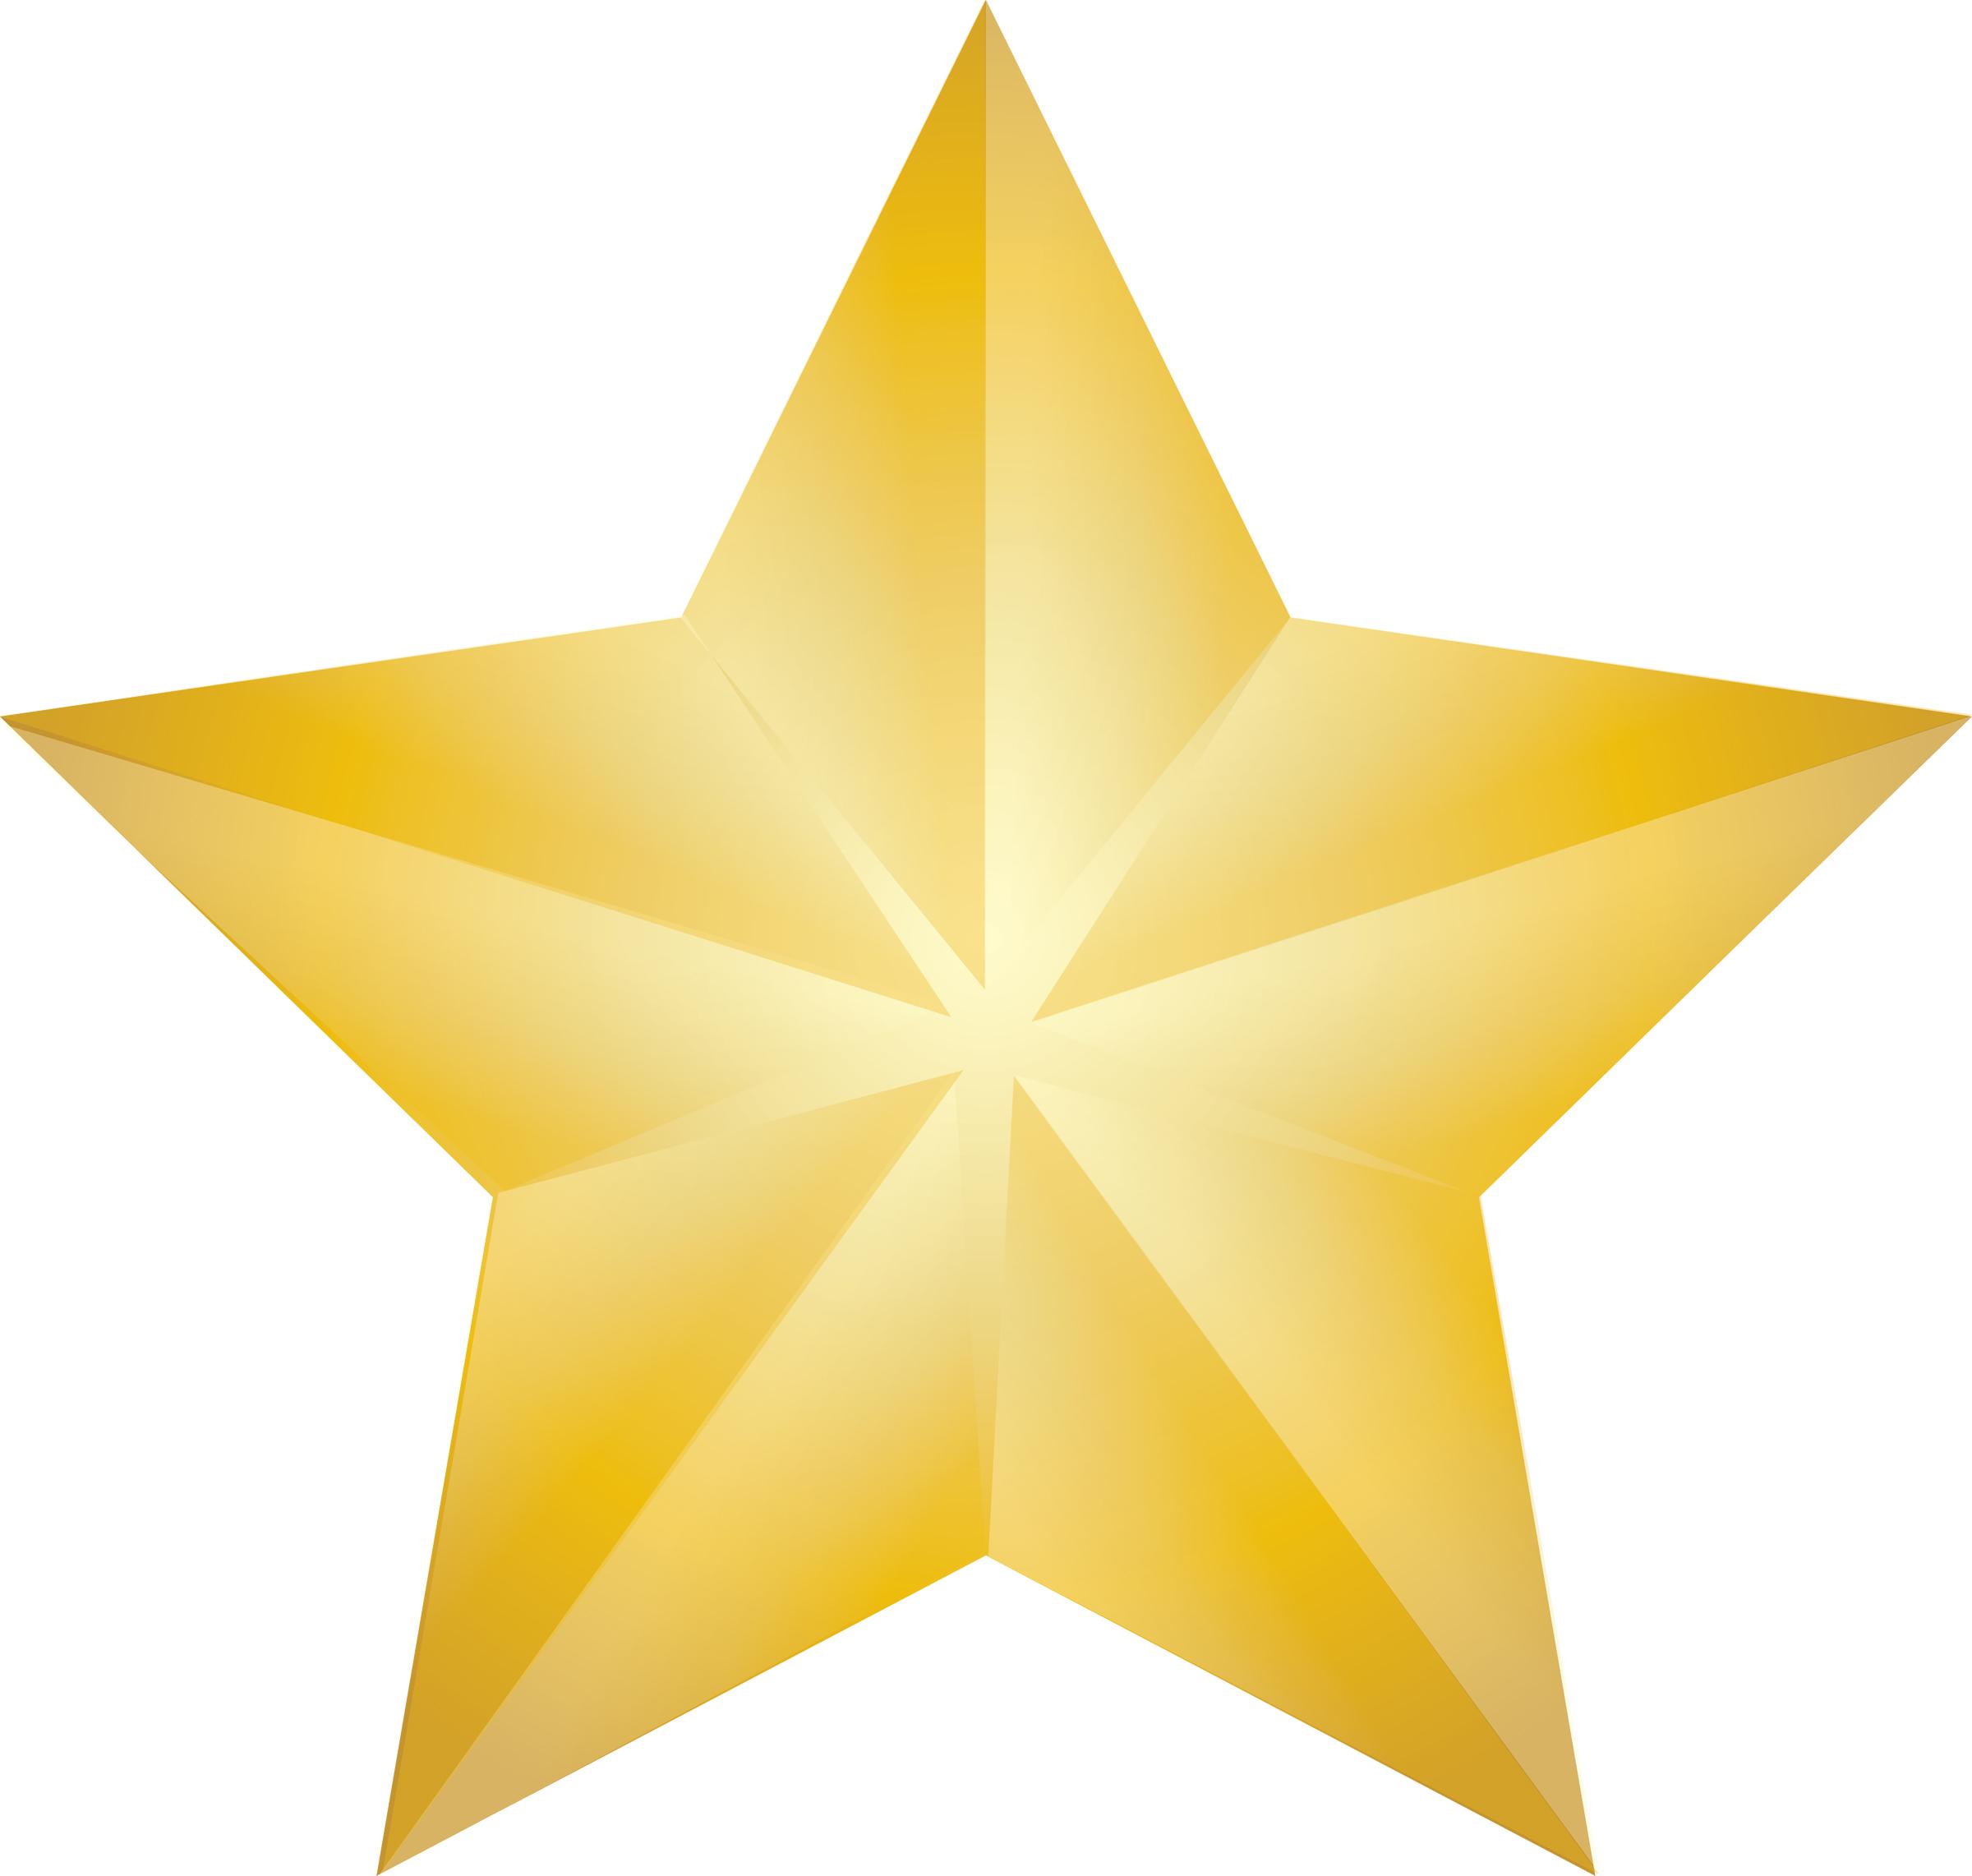 Clip Art Illustration Of A Shining Gold Christmas Star St Paul S